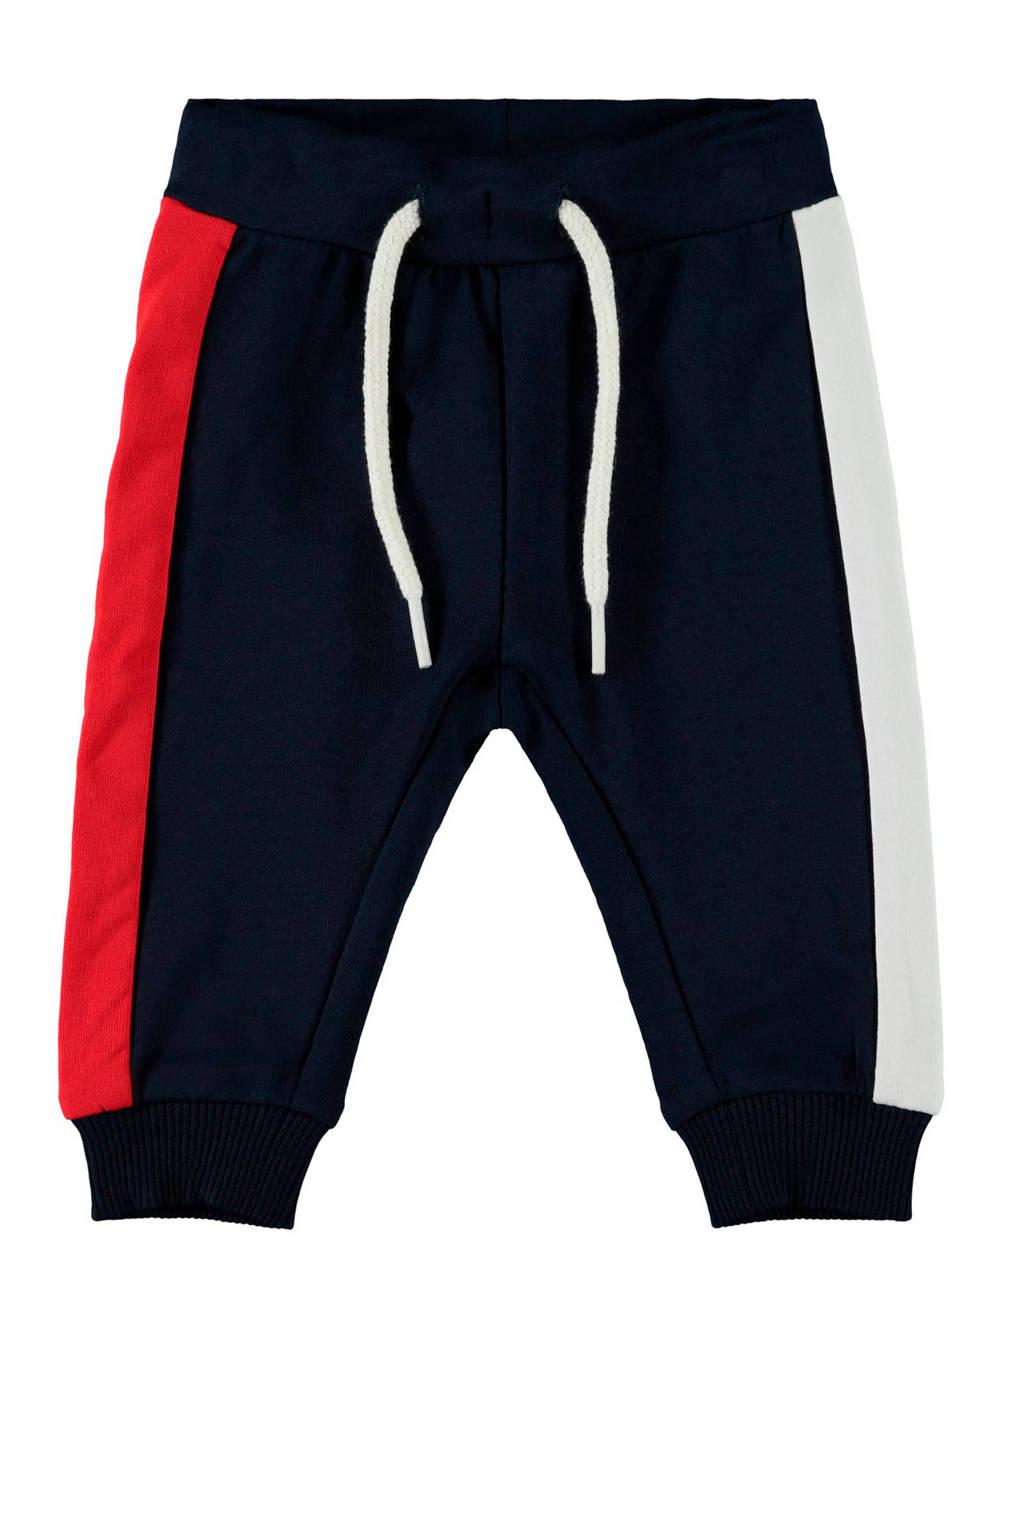 NAME IT BABY broek Defino donkerblauw/rood/wit, Donkerblauw/rood/wit